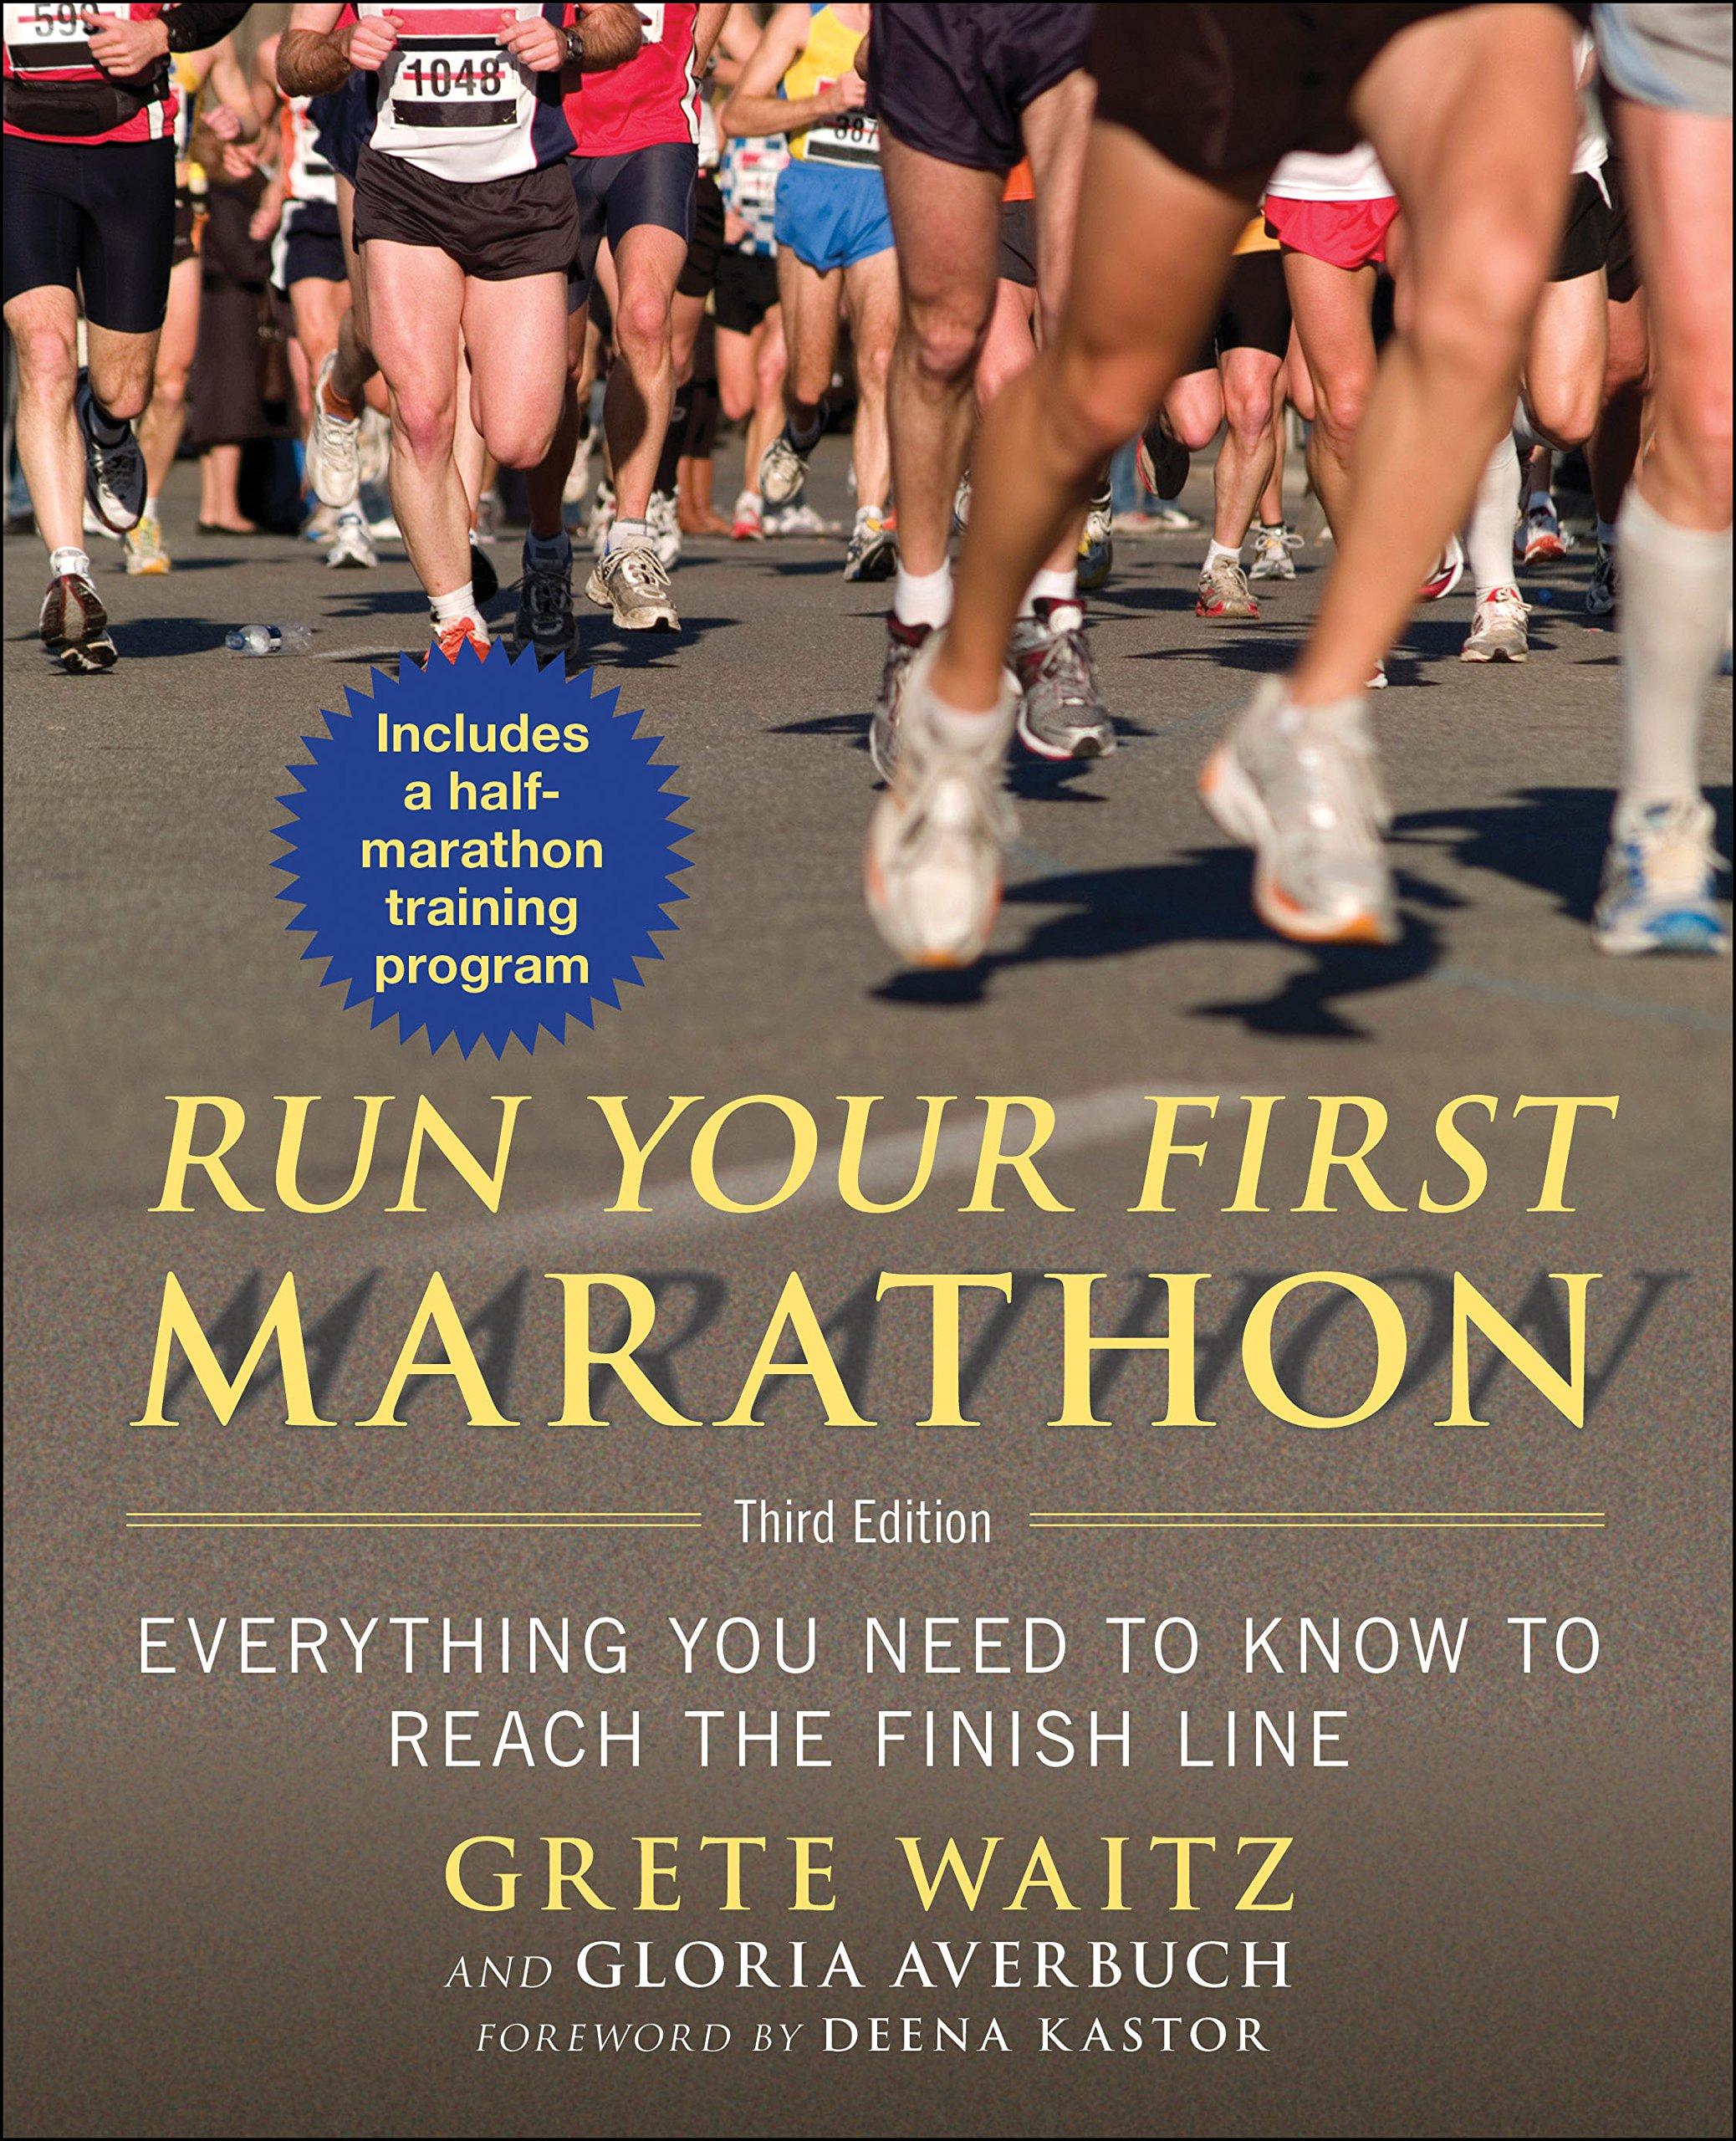 Run Your First Marathon: Everything You Need to Know to Reach the Finish  Line: Grete Waitz, Gloria Averbuch, Deena Kastor: 9781632203564:  Amazon.com: Books